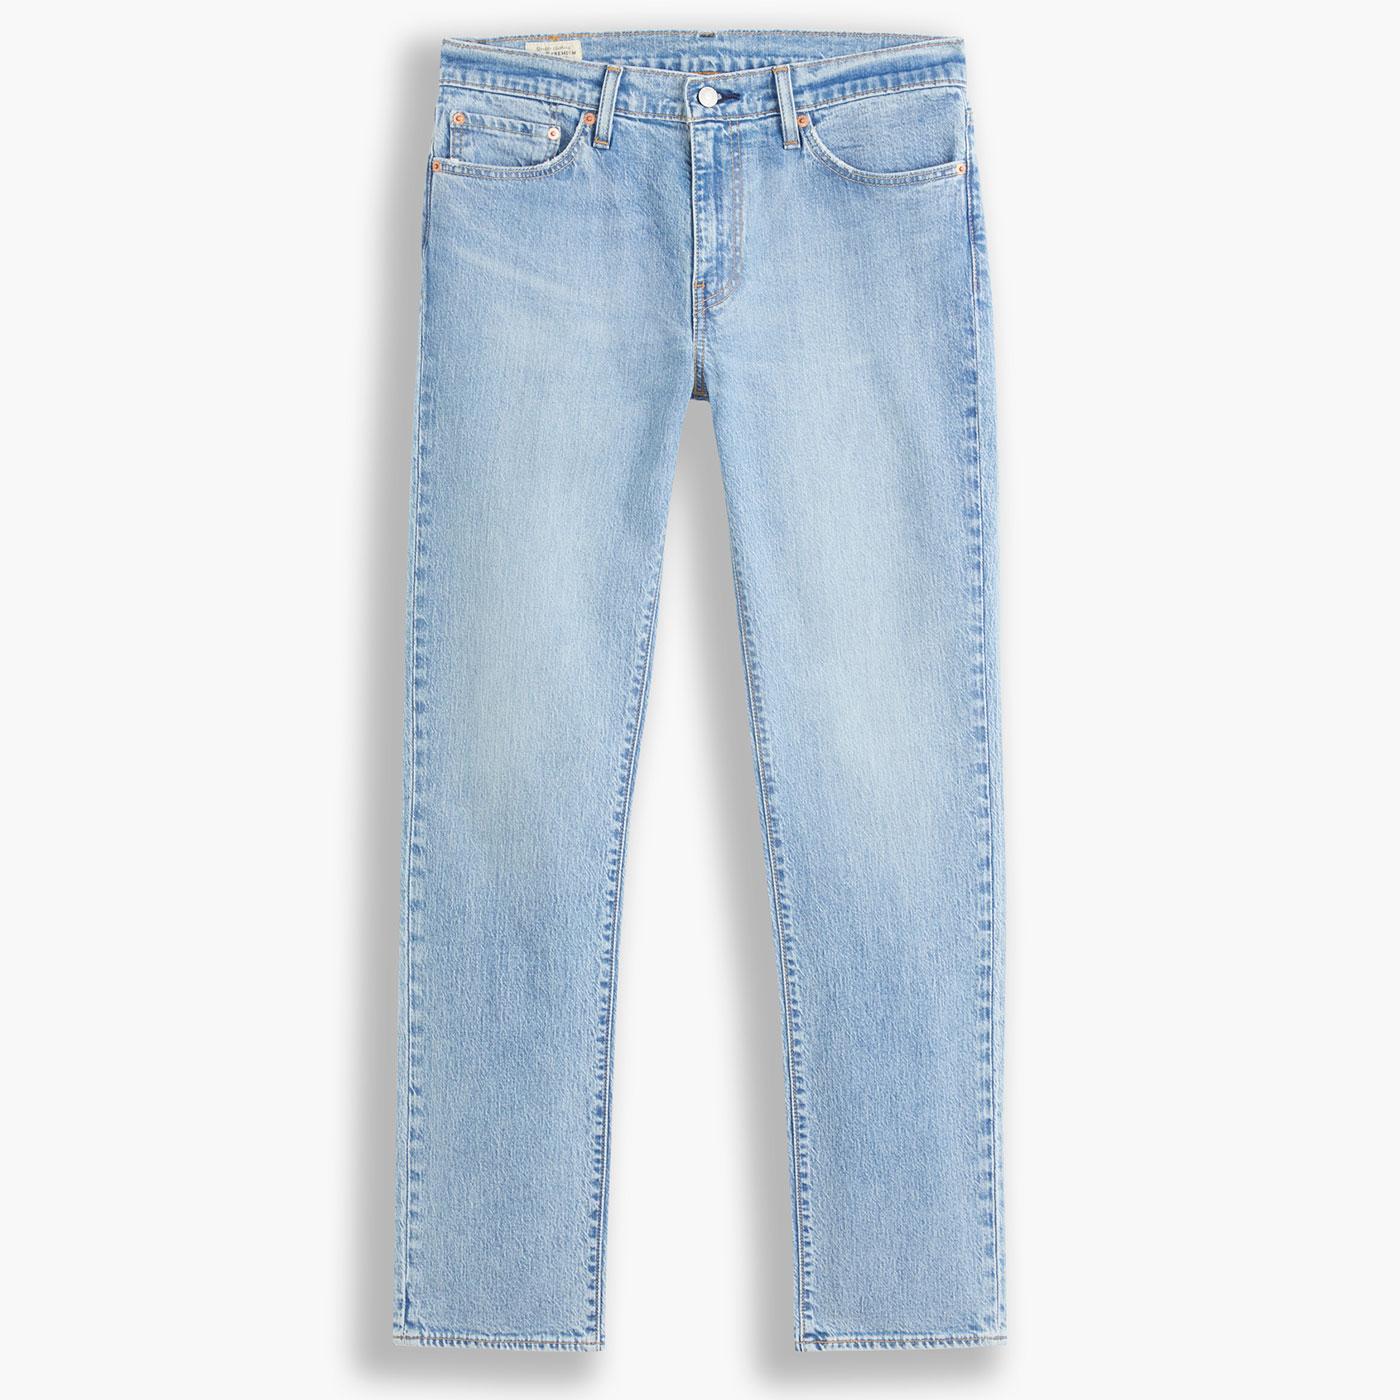 LEVI'S 511 Slim Everett Twilight Tone Retro Jeans